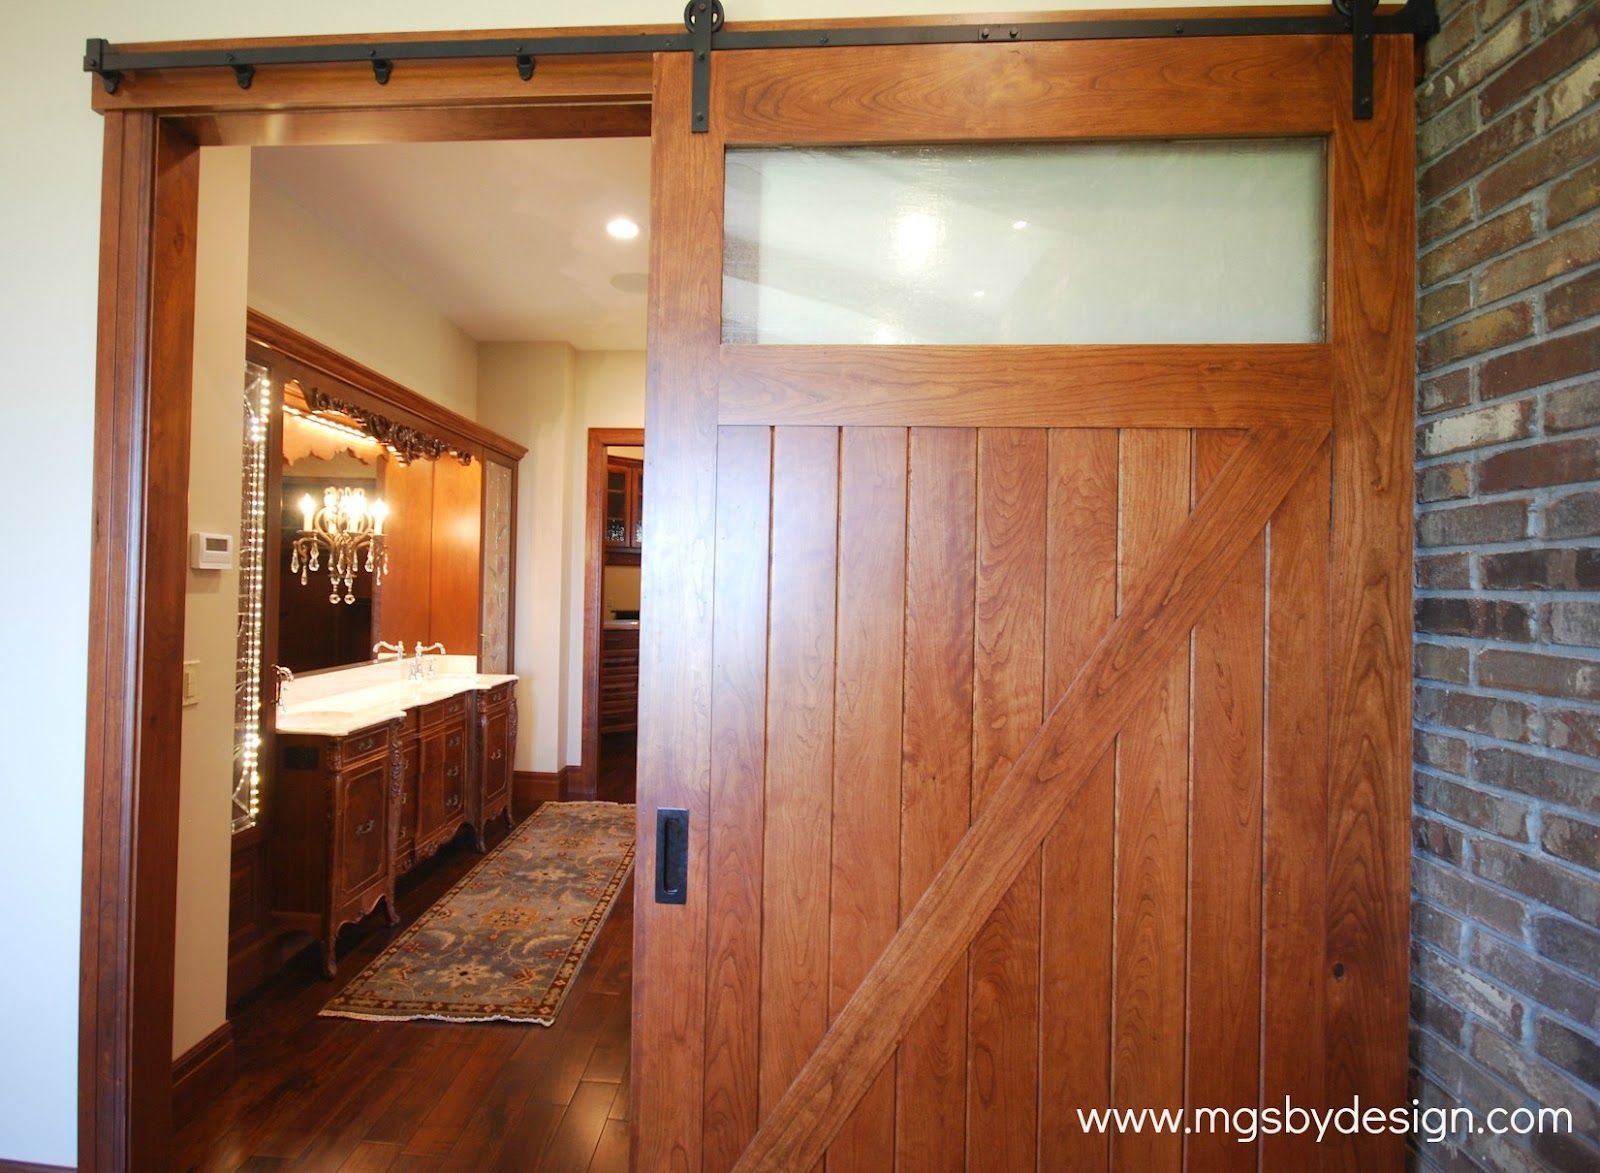 barn door from master bedroom leading into master bath. Black Bedroom Furniture Sets. Home Design Ideas